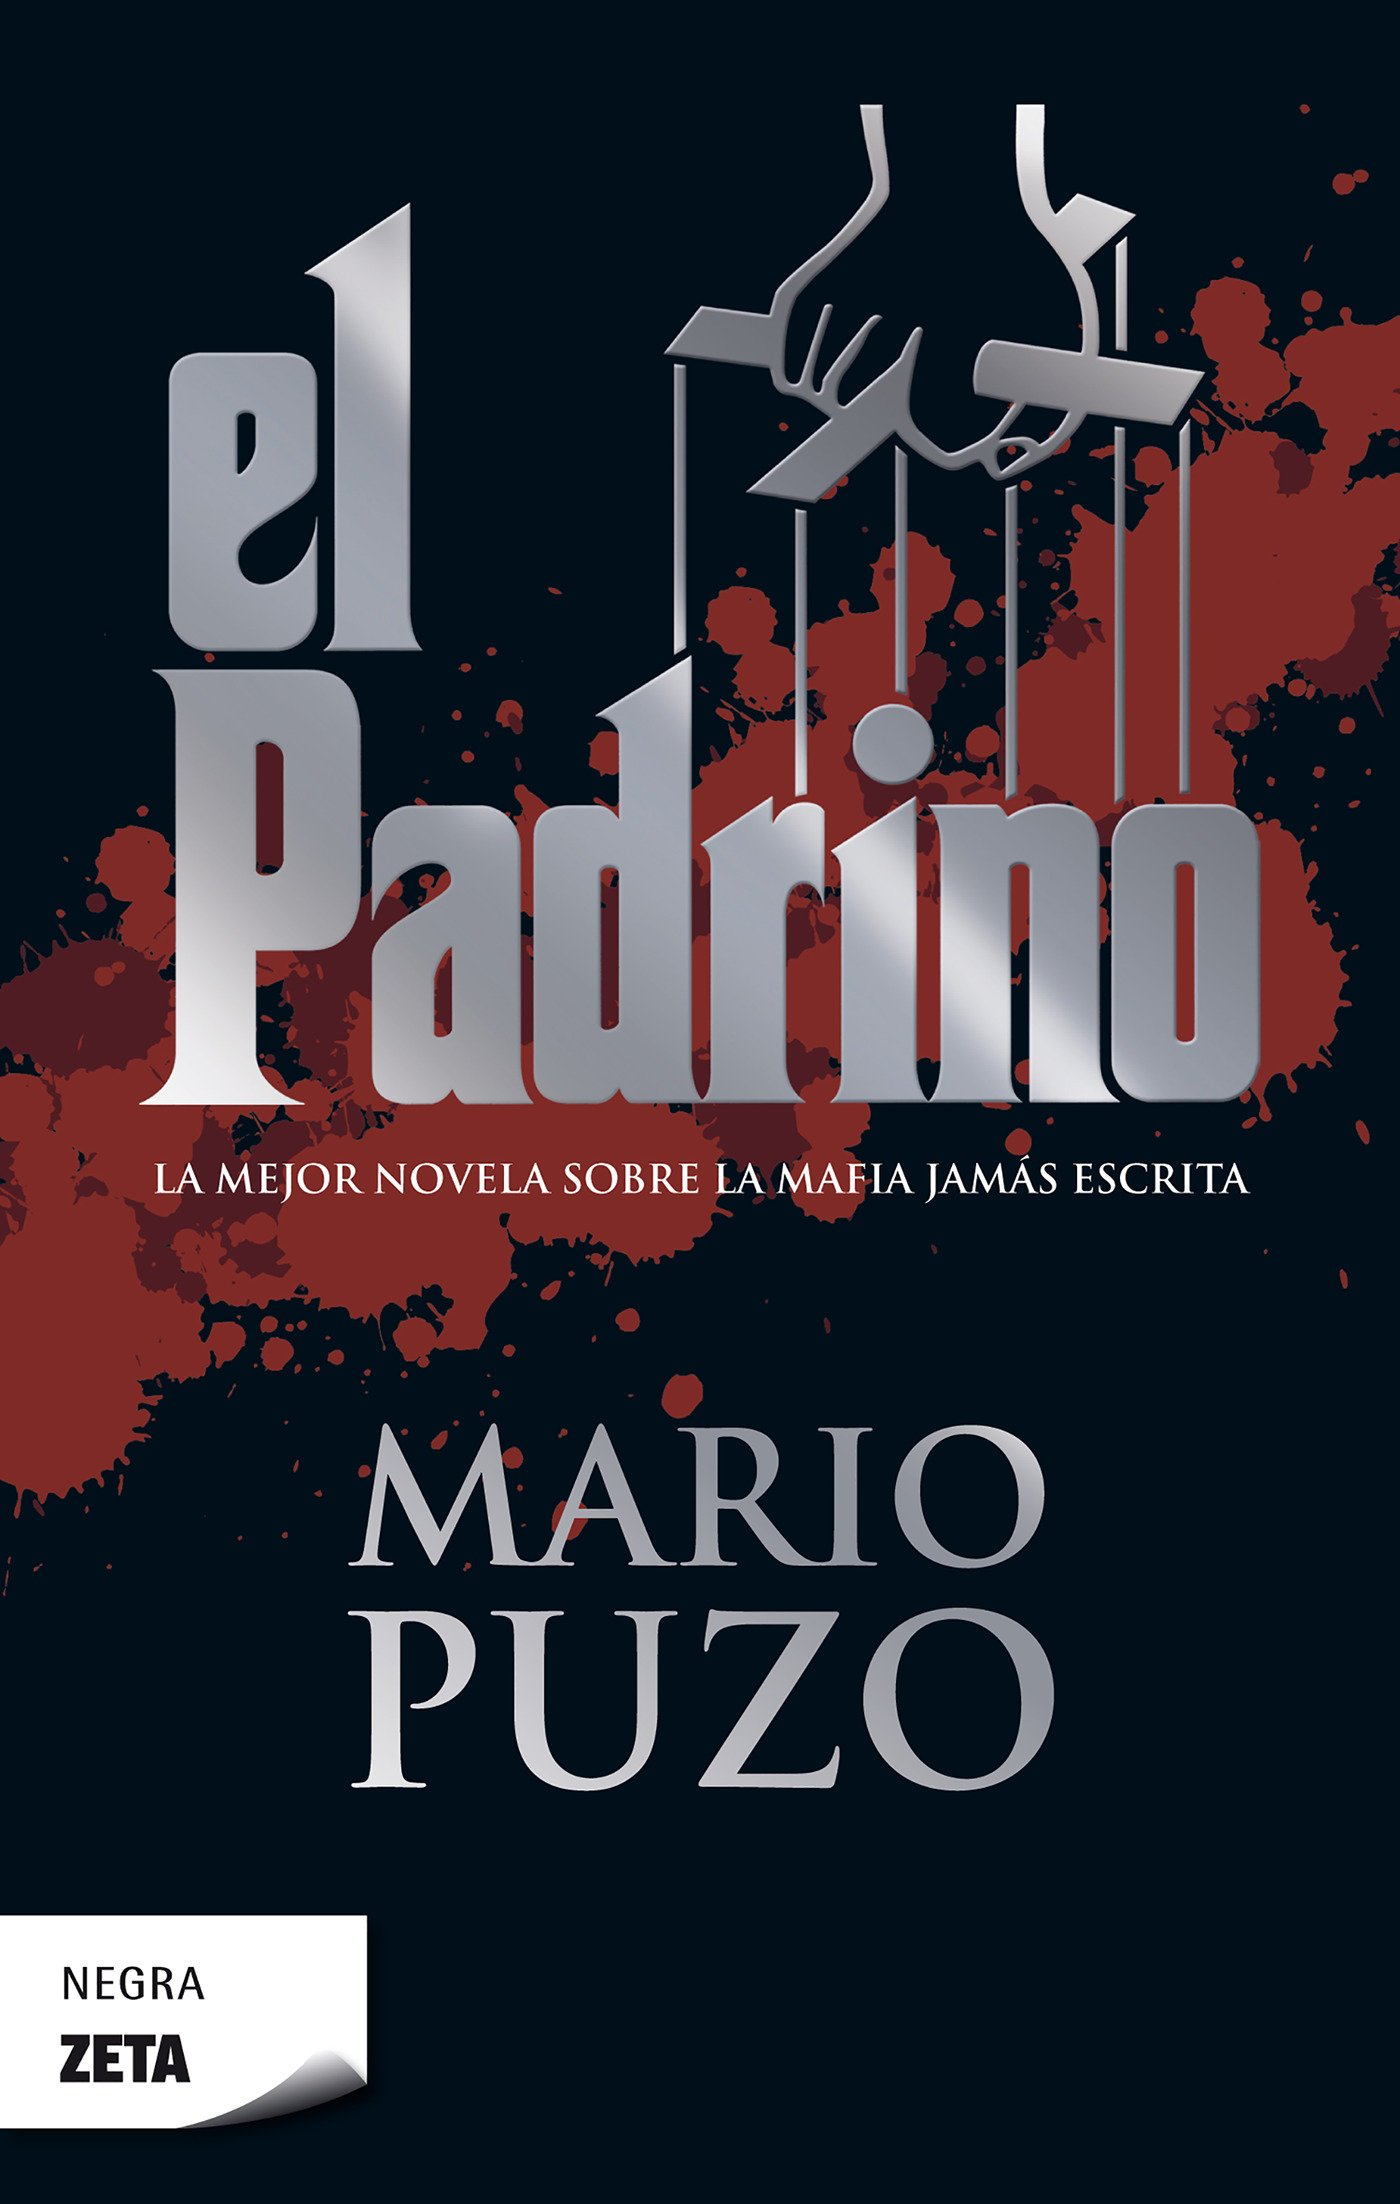 Image result for el padrino mario puzo